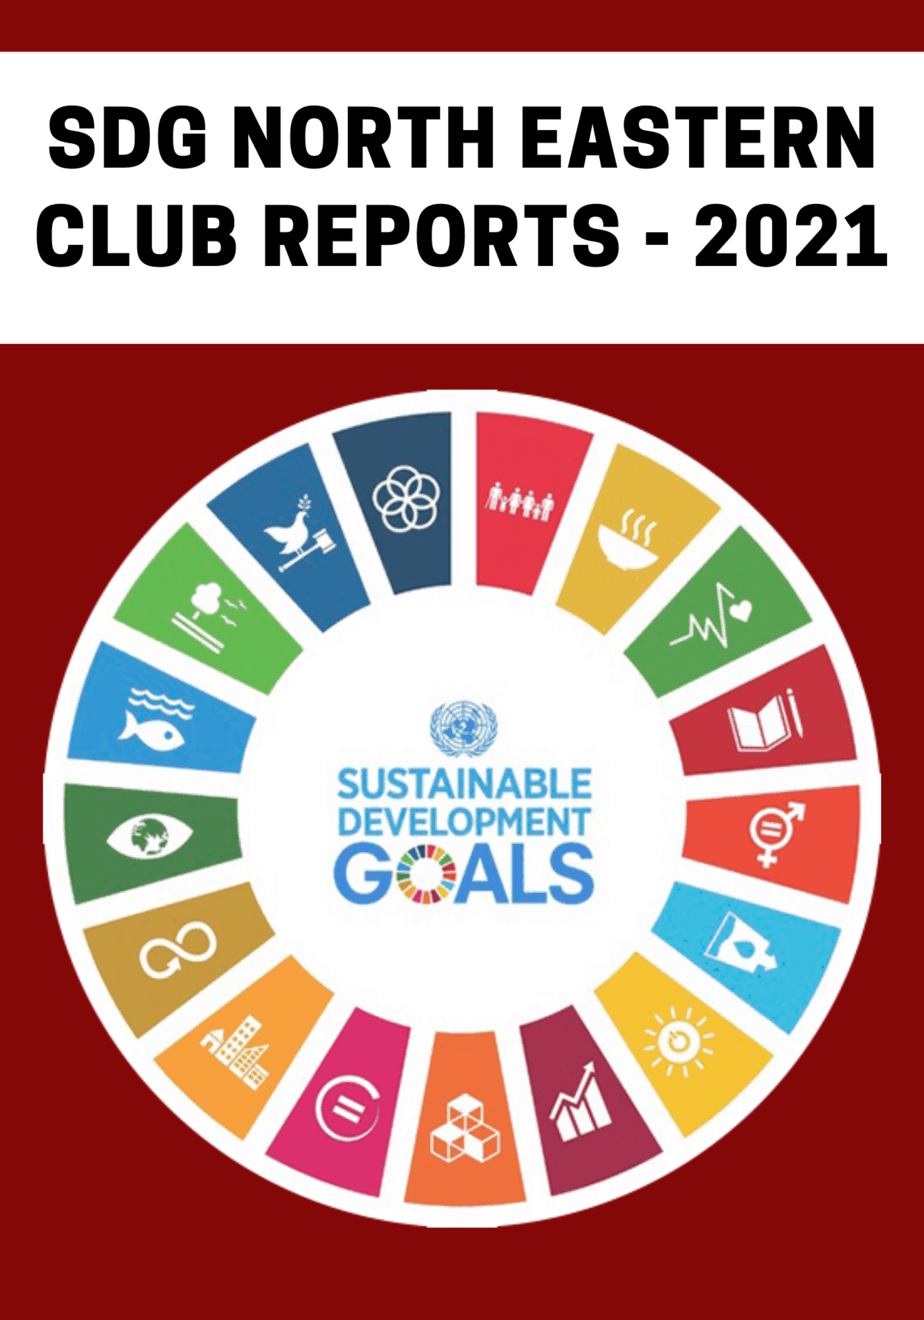 SDG – NORTH EASTERN CLUB REPORTS – 2021